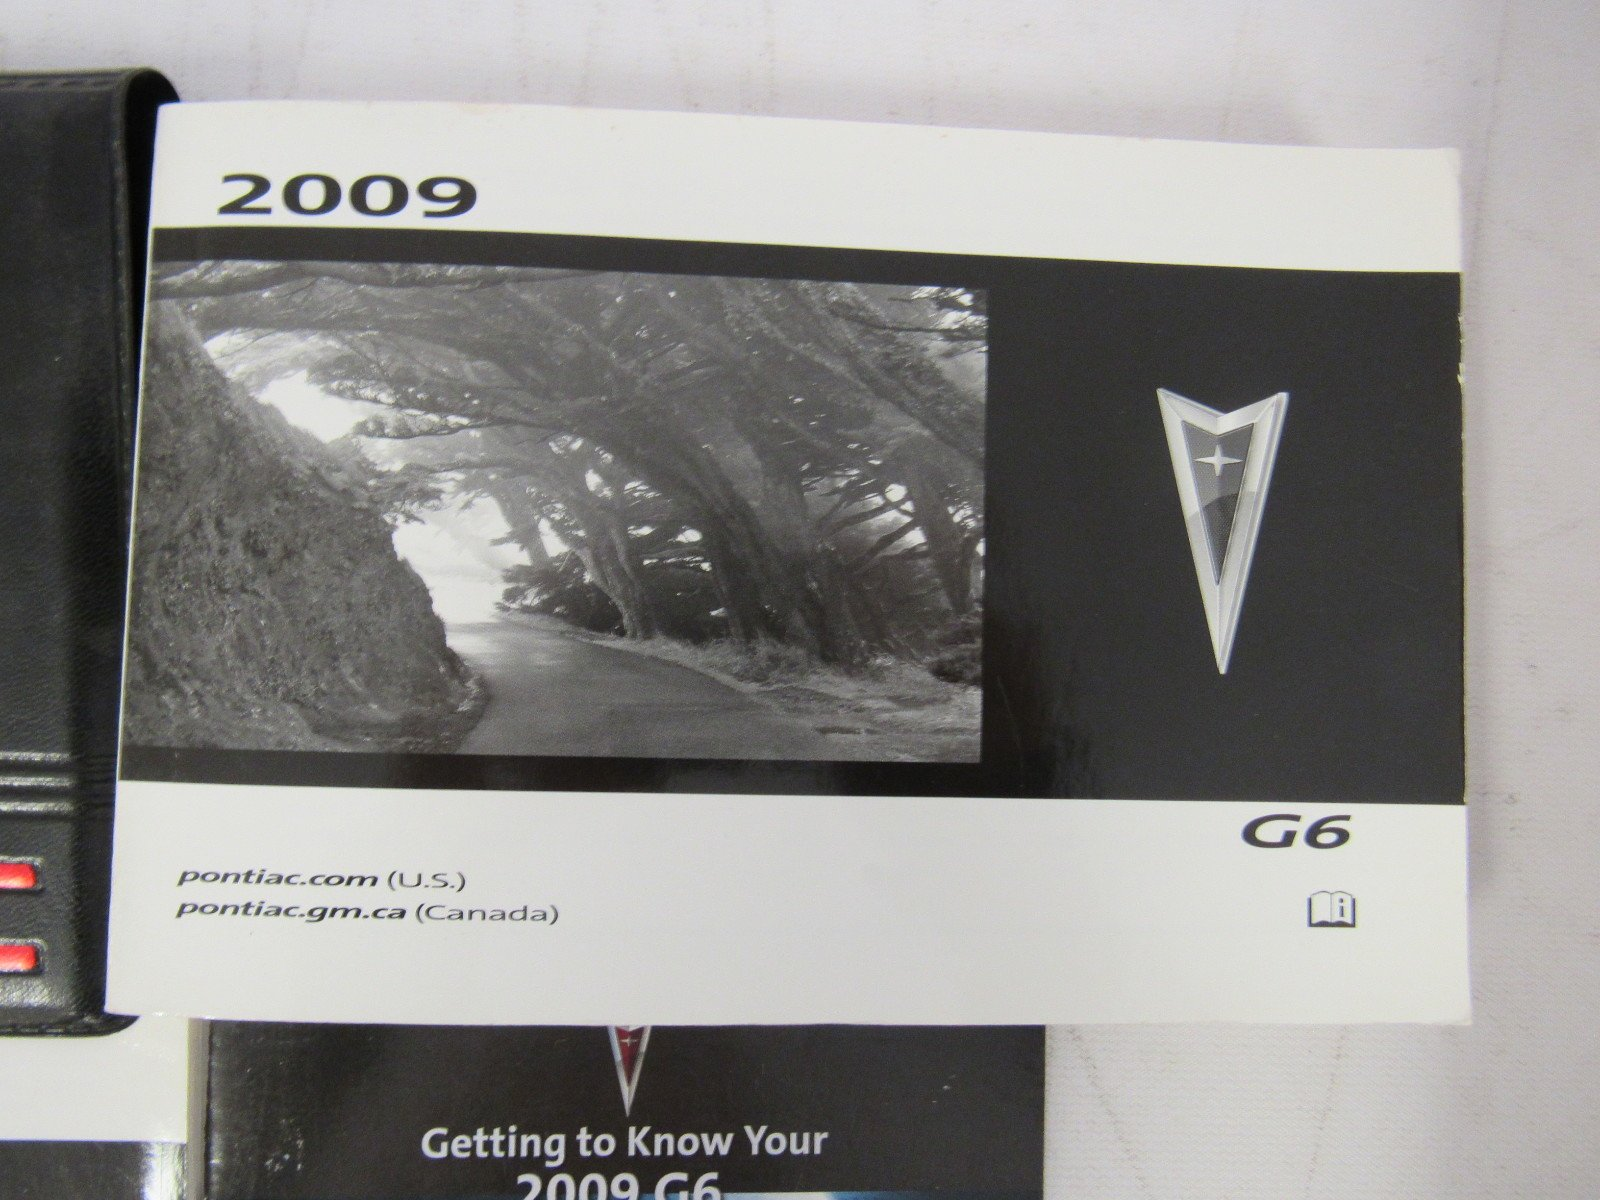 2009 pontiac g6 owners manual guide book amazon com books rh amazon com Pontiac G6 Warning Lights and Their Meaning pontiac g6 owners manual 2008